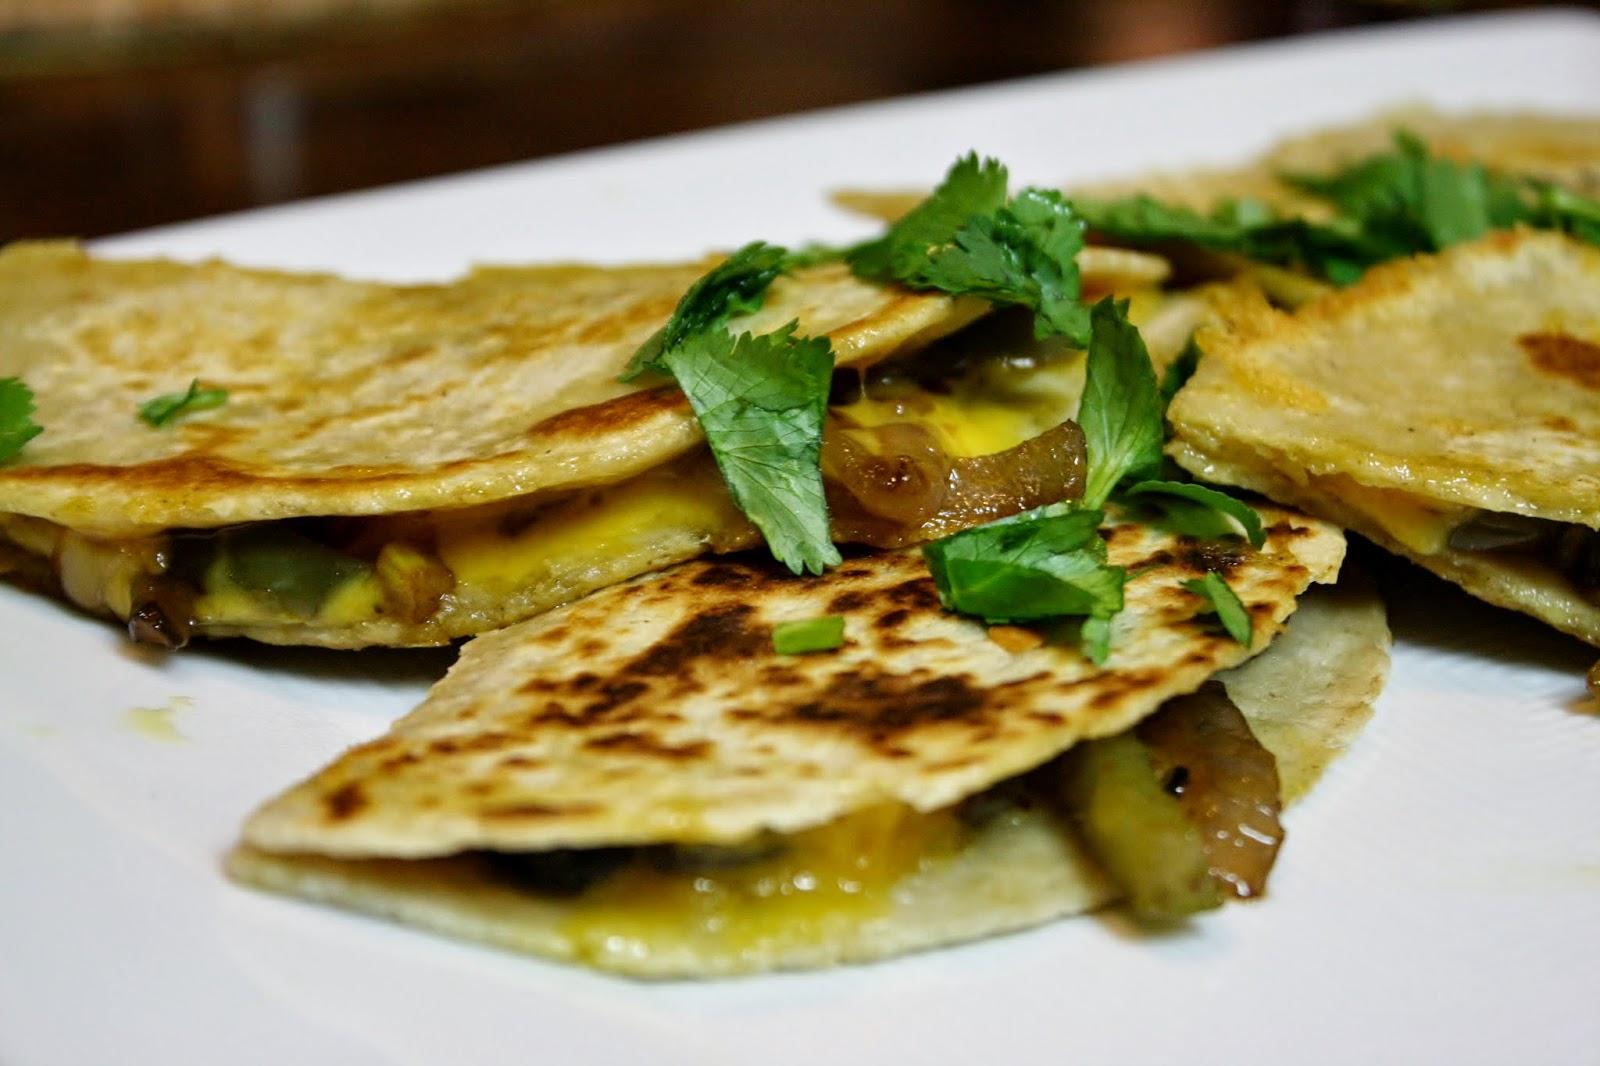 http://eatprayjuice.blogspot.com/2015/02/fajita-quesadillas.html